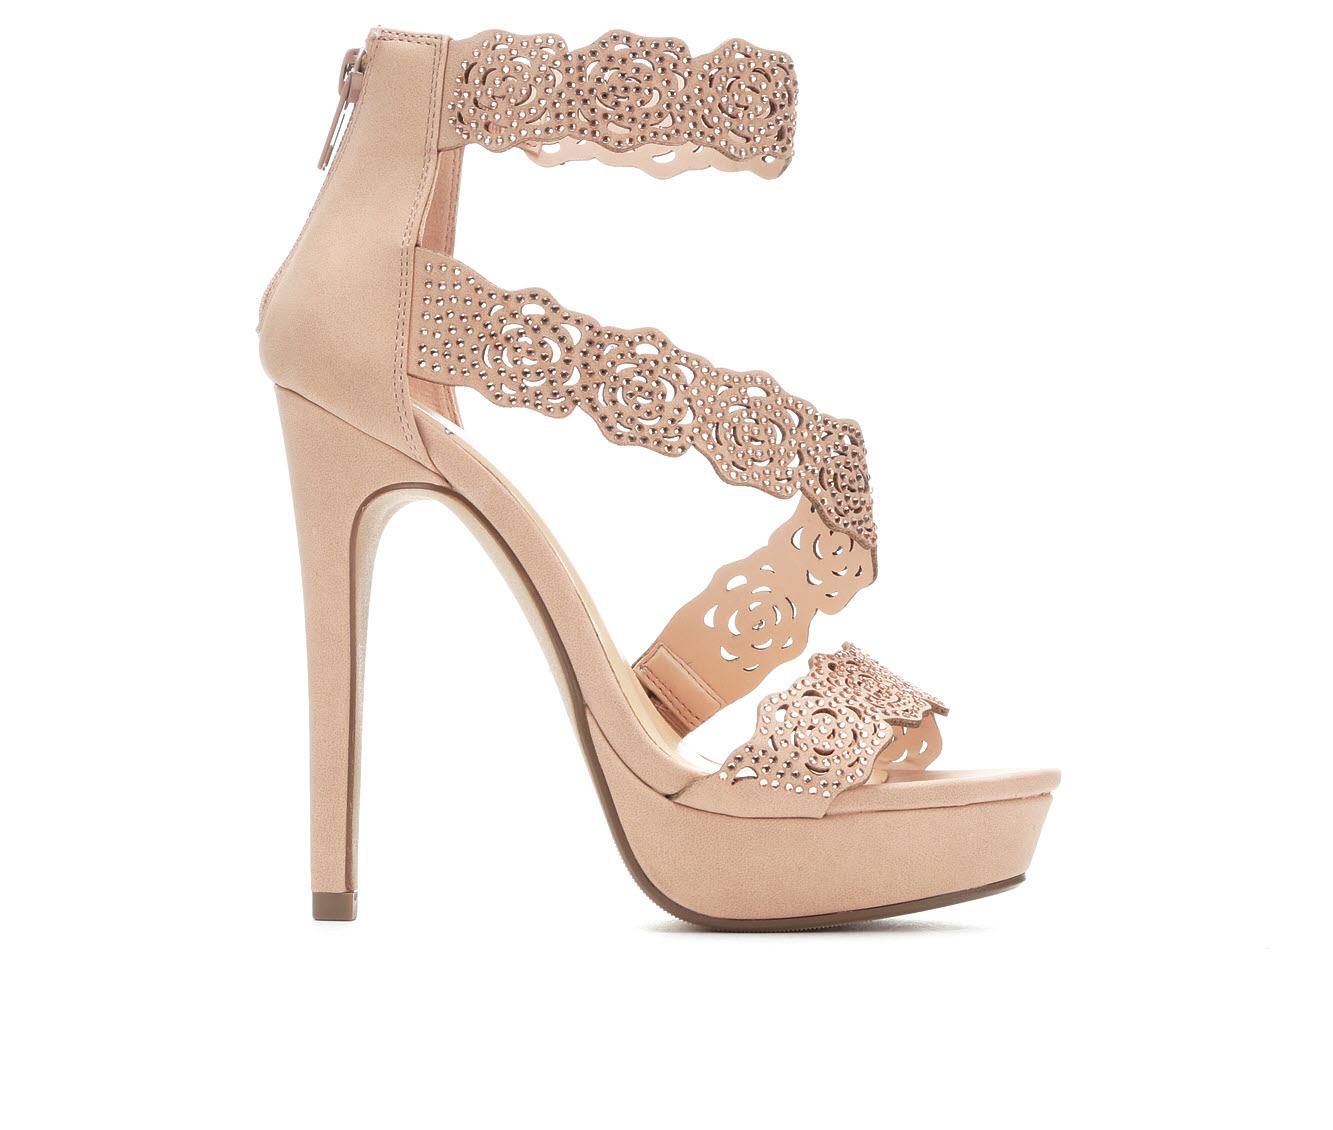 Delicious Yodels Women's Dress Shoe (Pink Faux Leather)